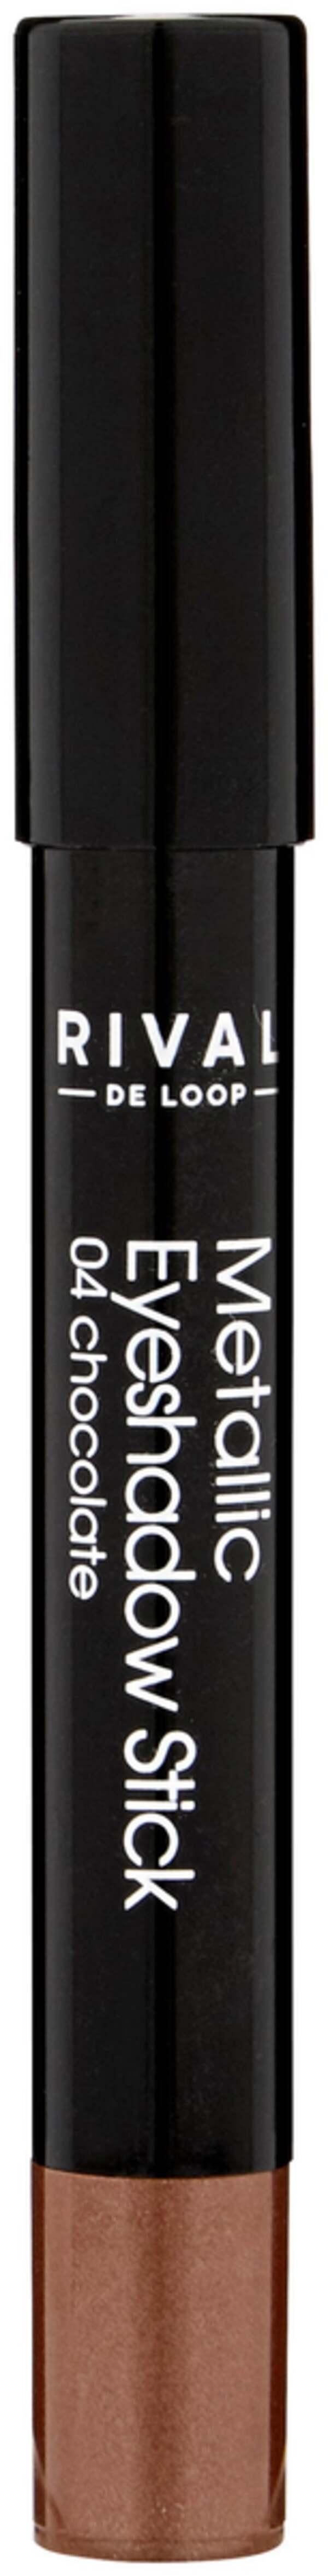 Rival de Loop Metallic Eyeshadow Stick 04